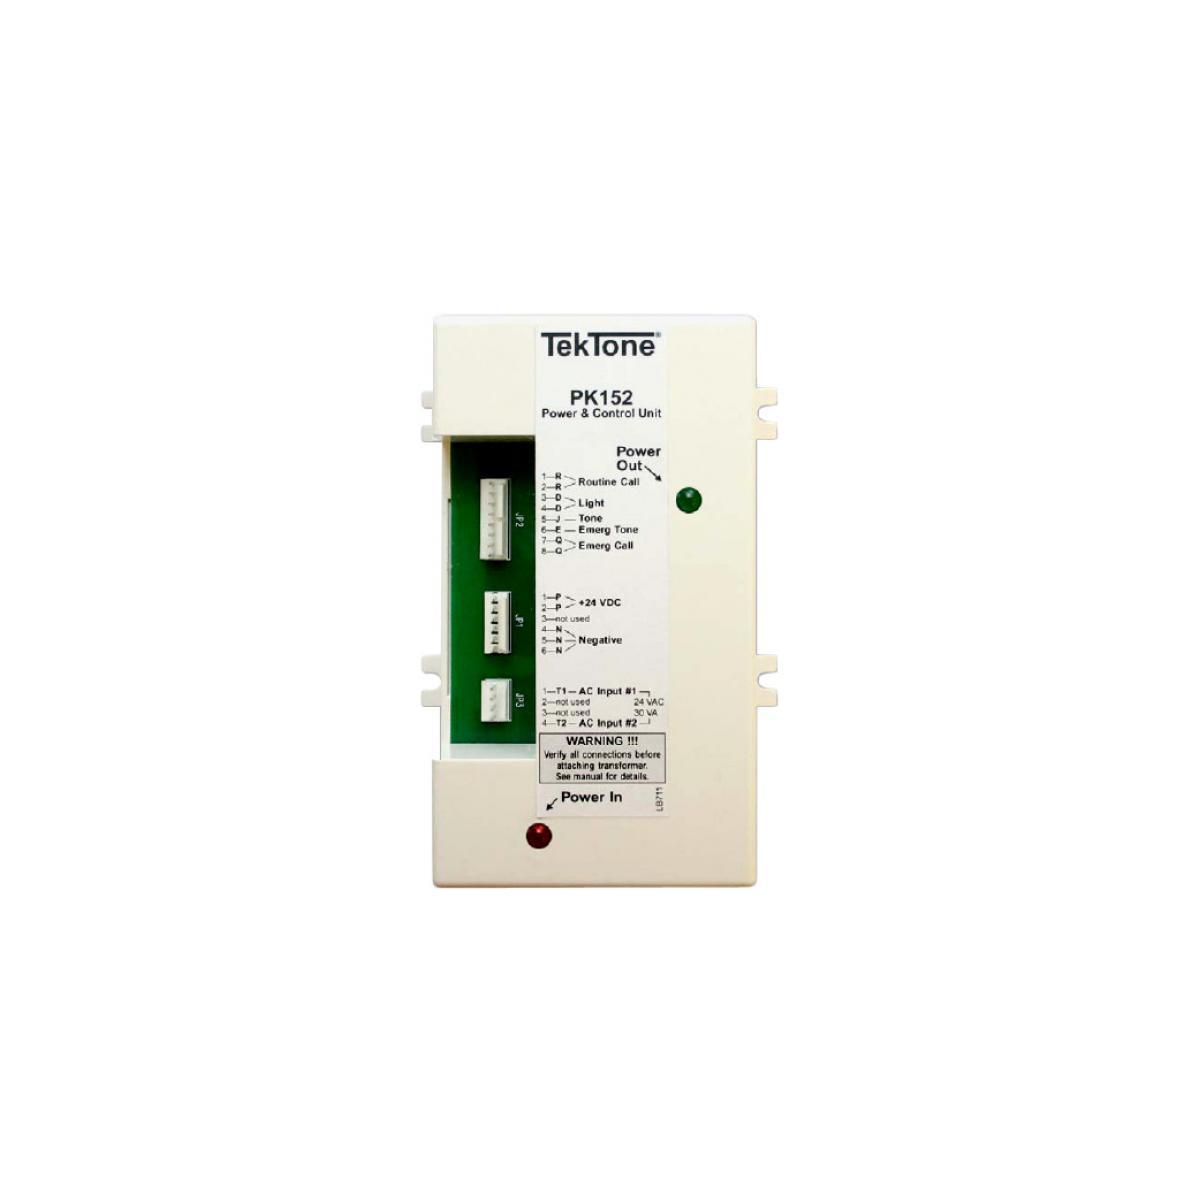 tektone pk 543 lifier wiring diagram